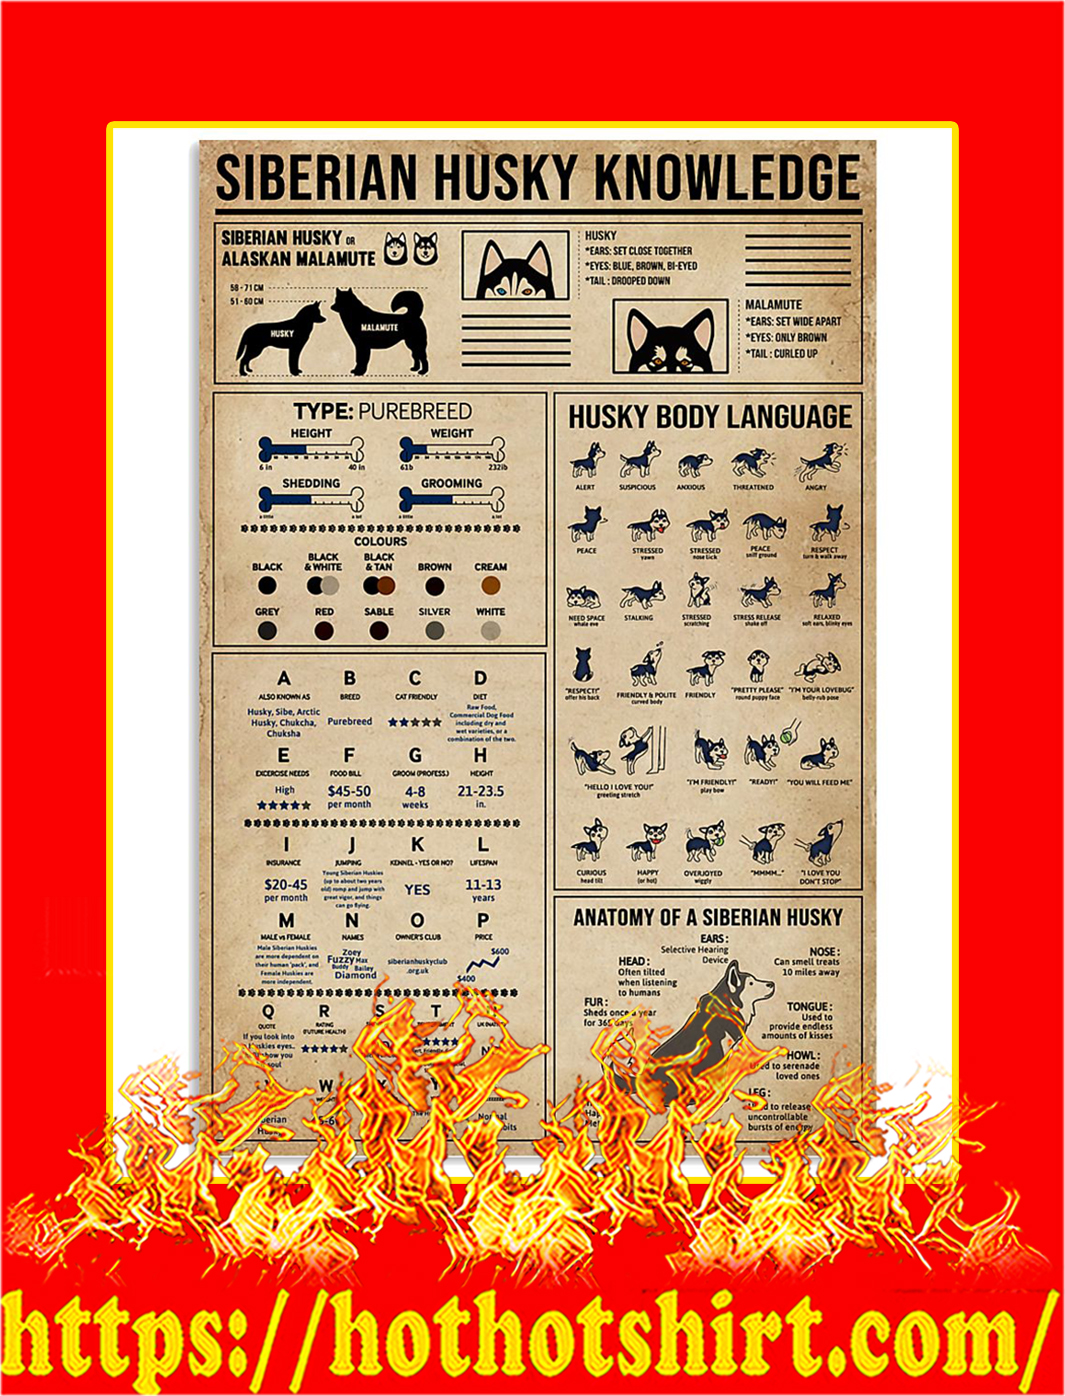 Siberian Husky Knowledge Poster